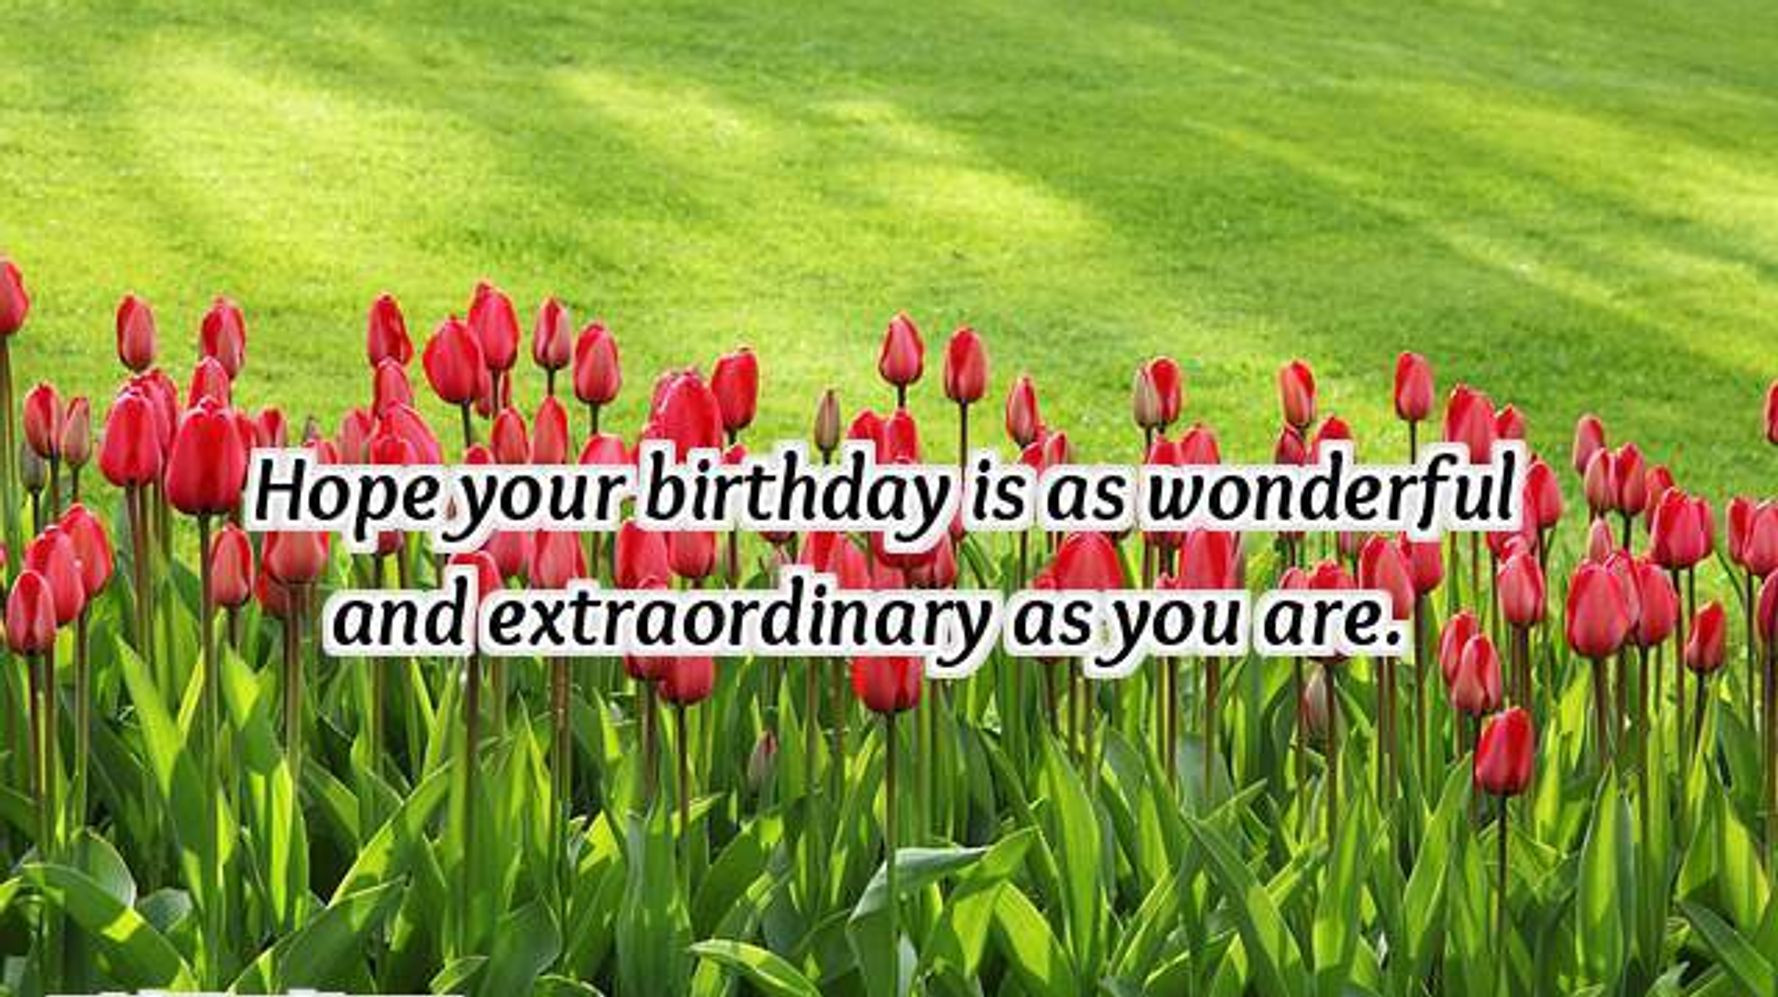 Birthday Wishes For Best Friend  23 Birthday Wishes for Friends & Best Friend Happy